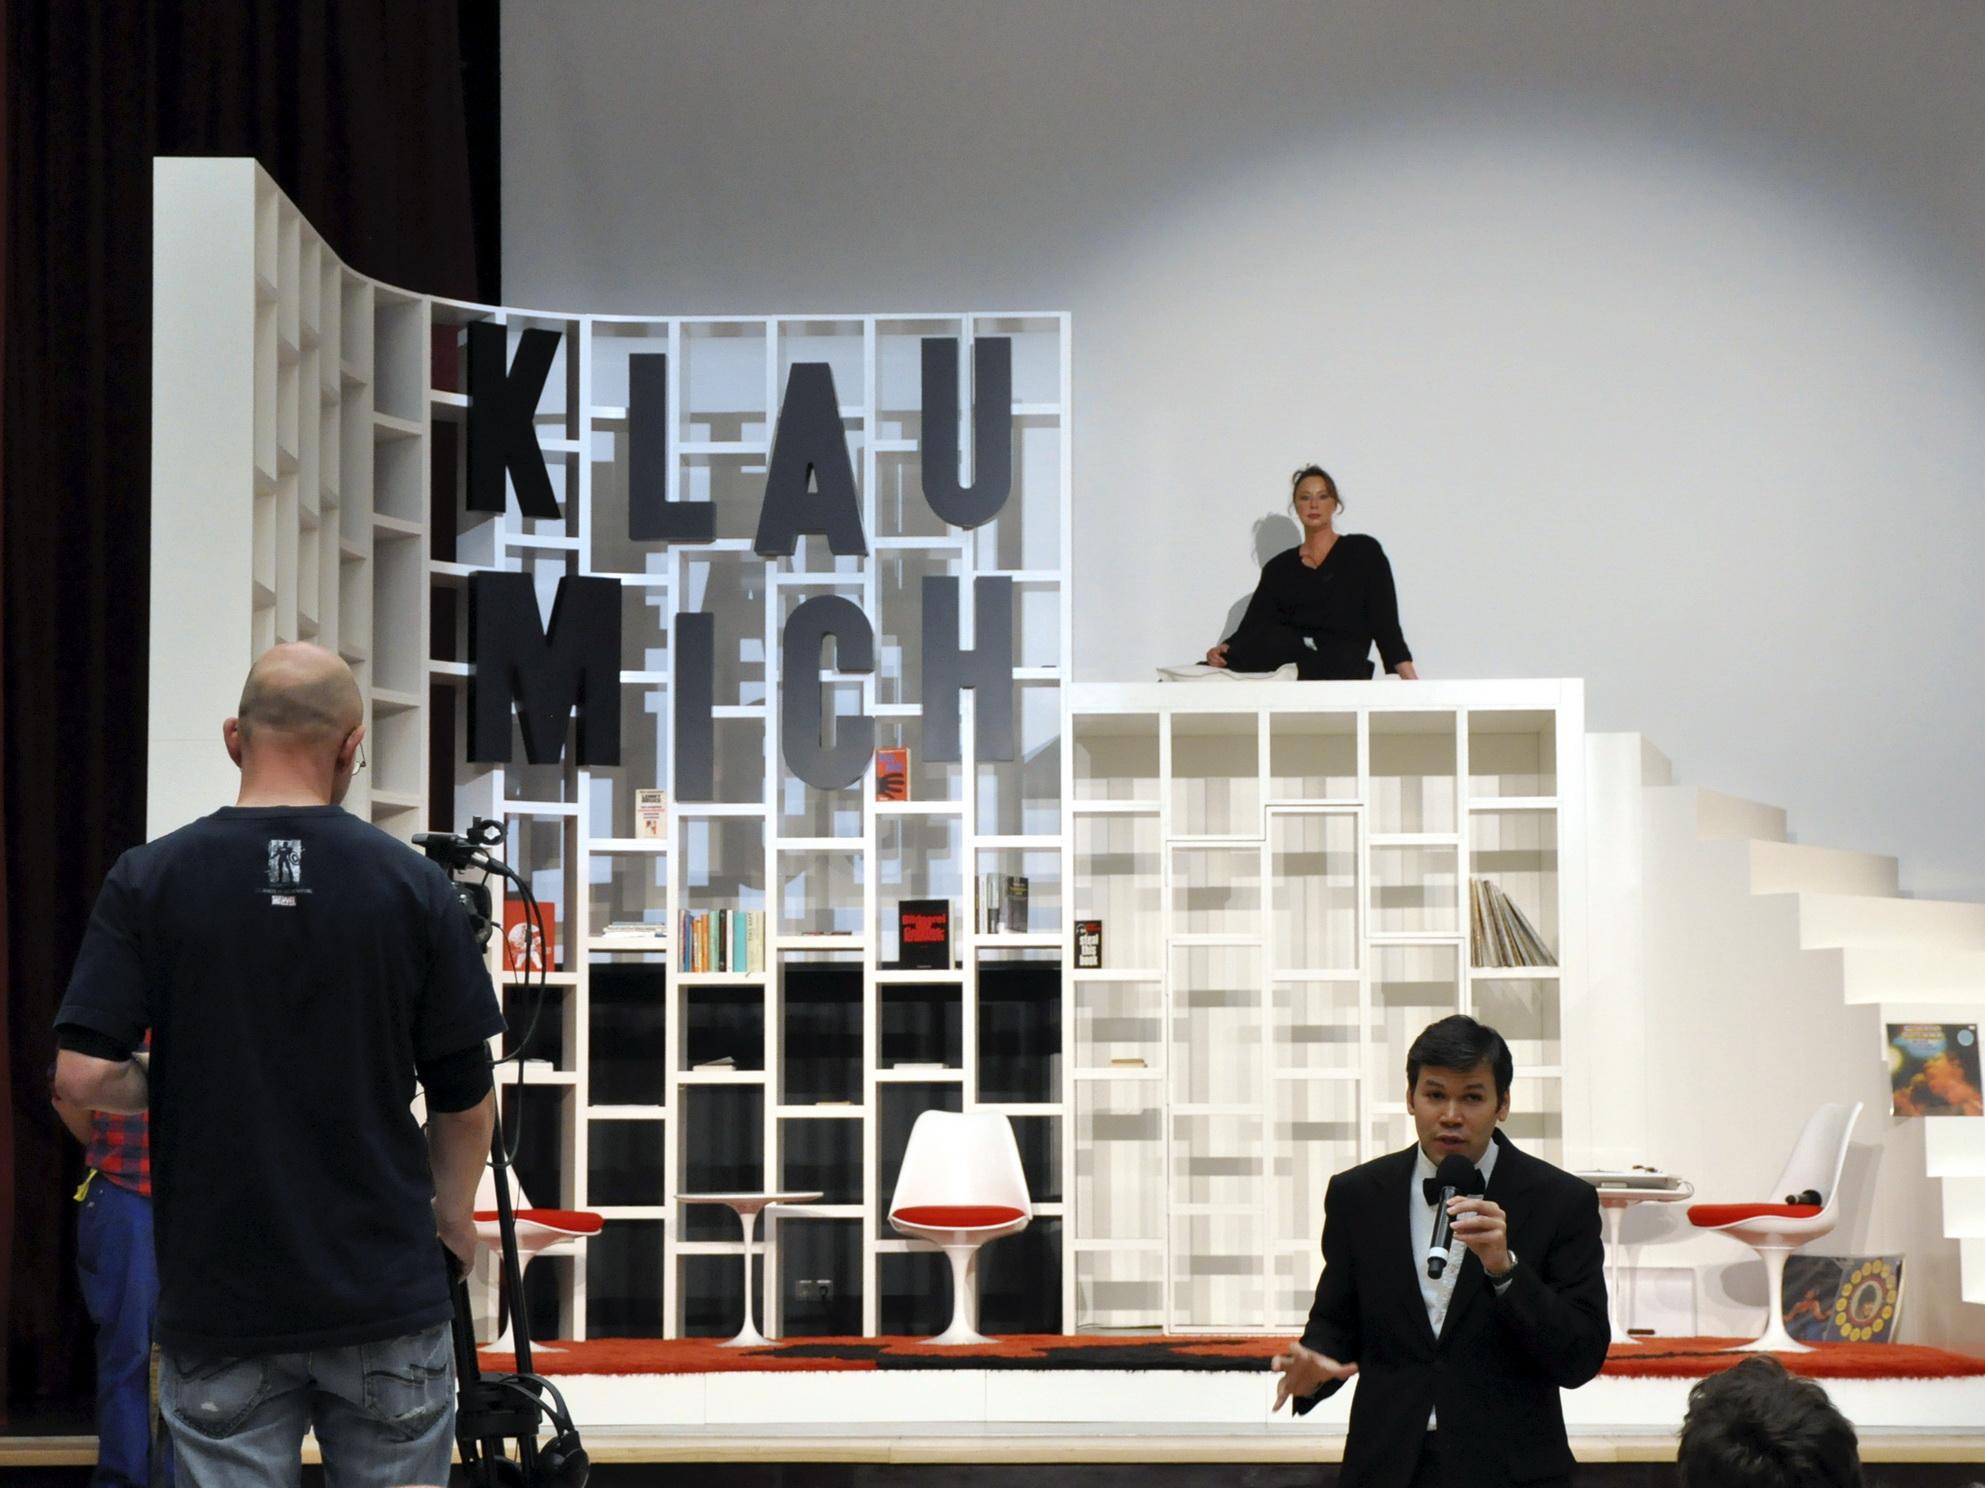 Die Klau Mich Show, 2012 |  | ProjecteSD